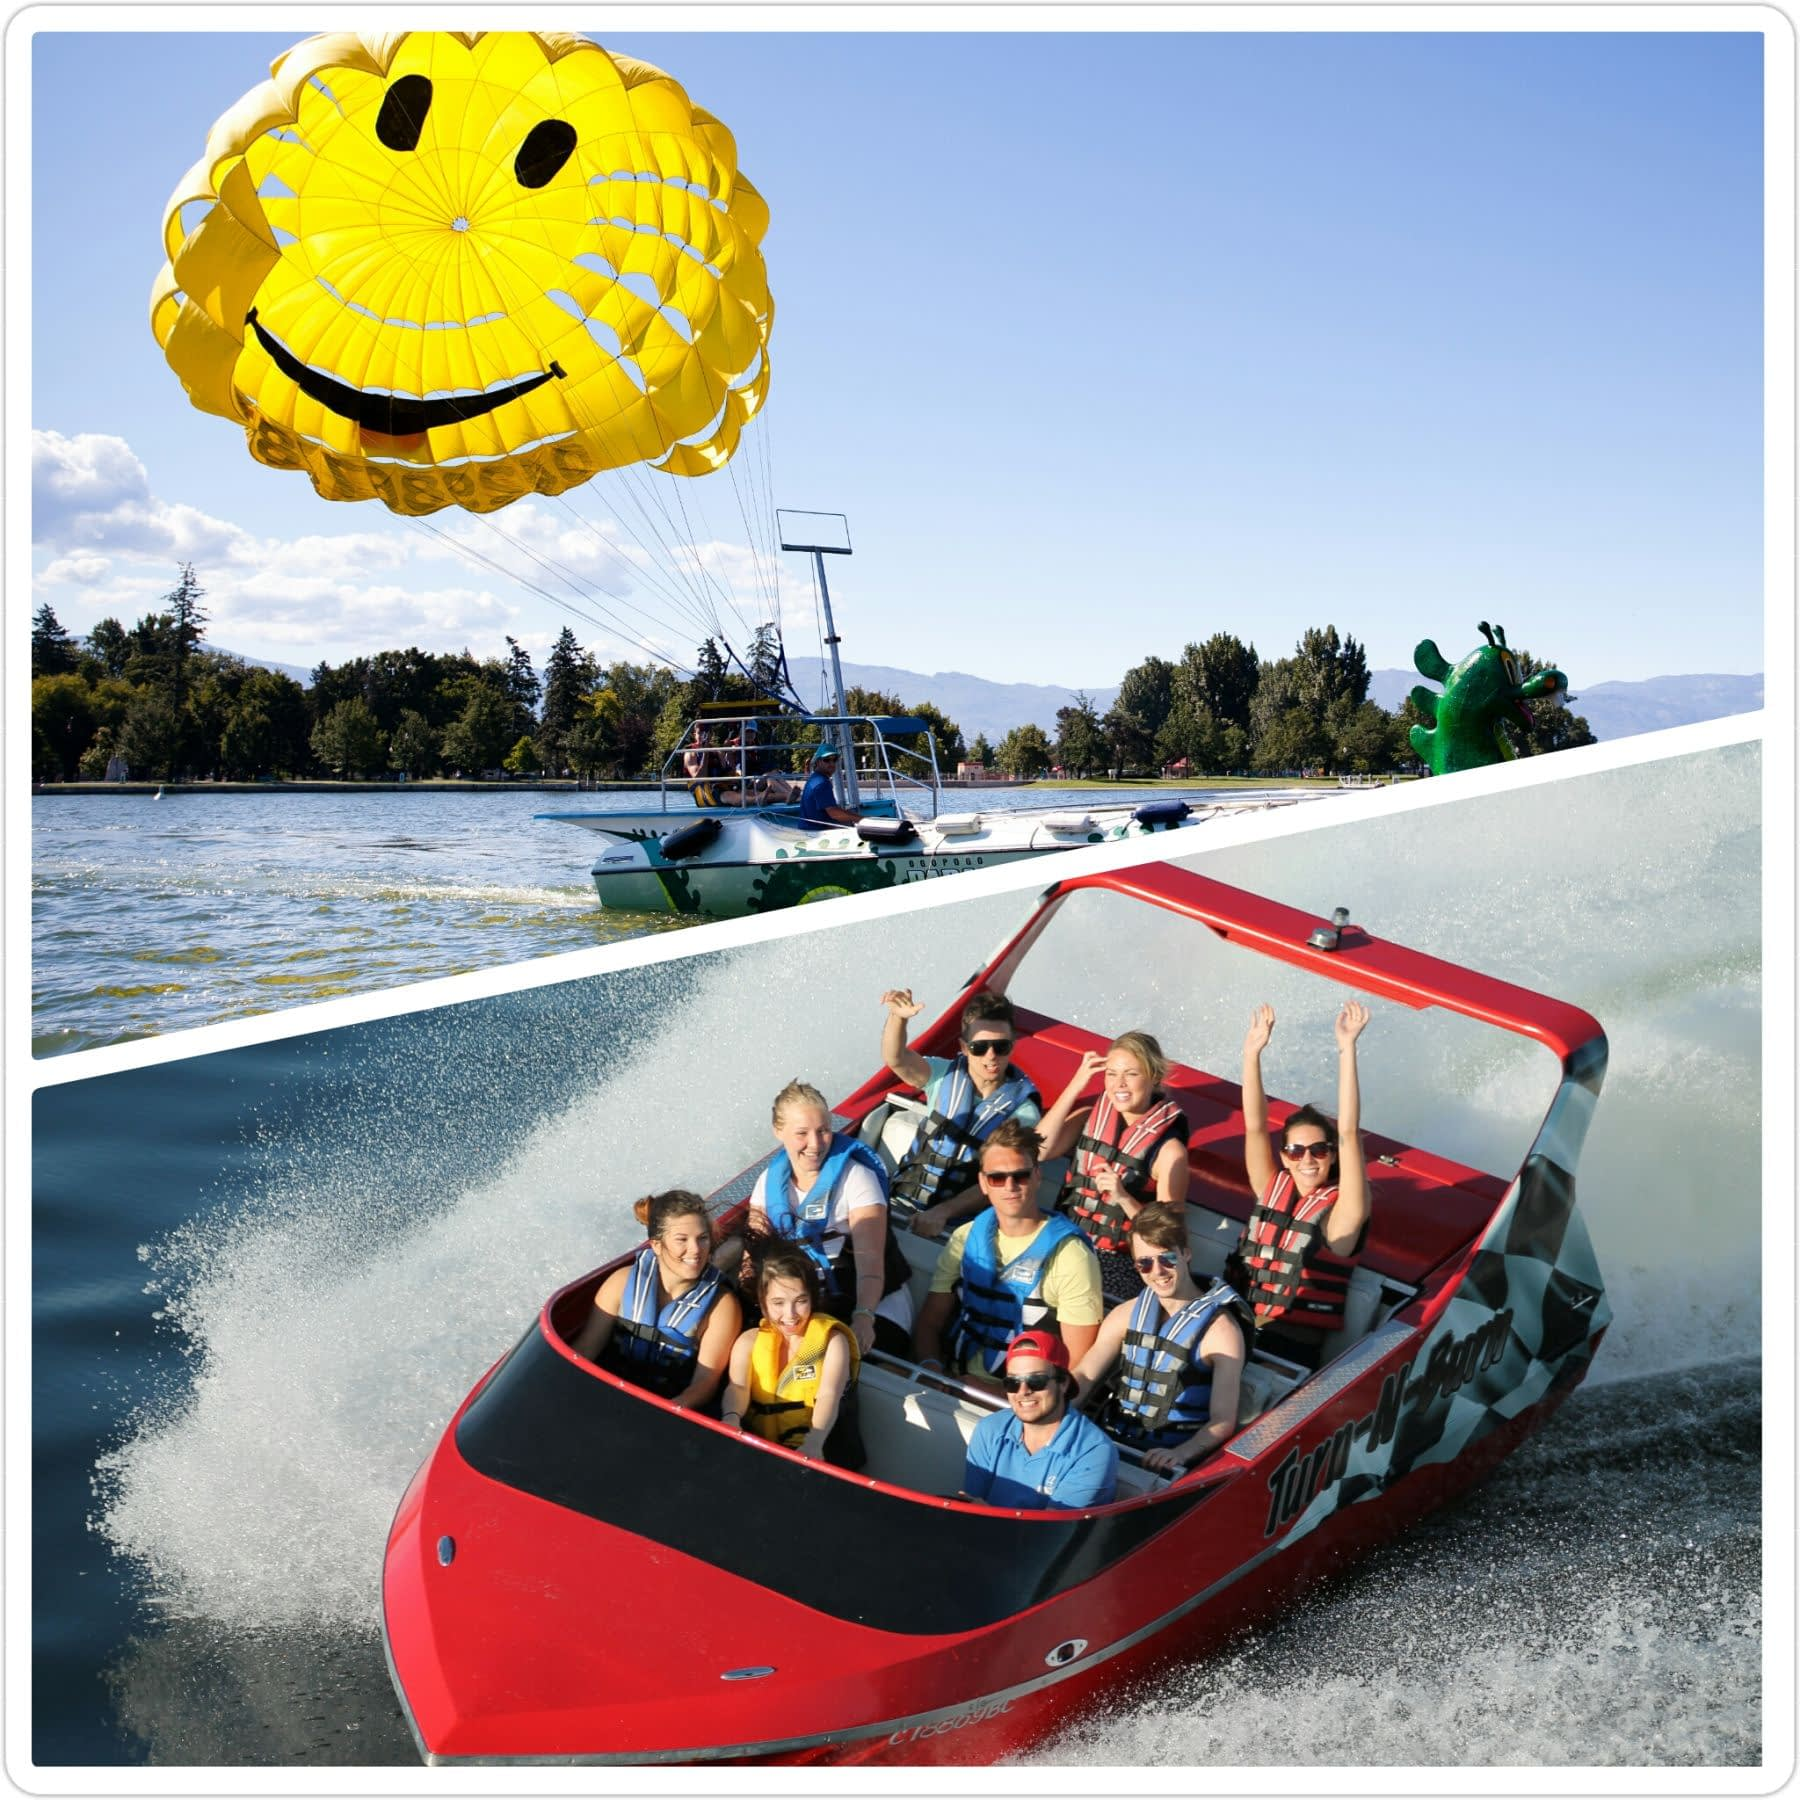 Kelowna Parasail & Jet Boat Adventure